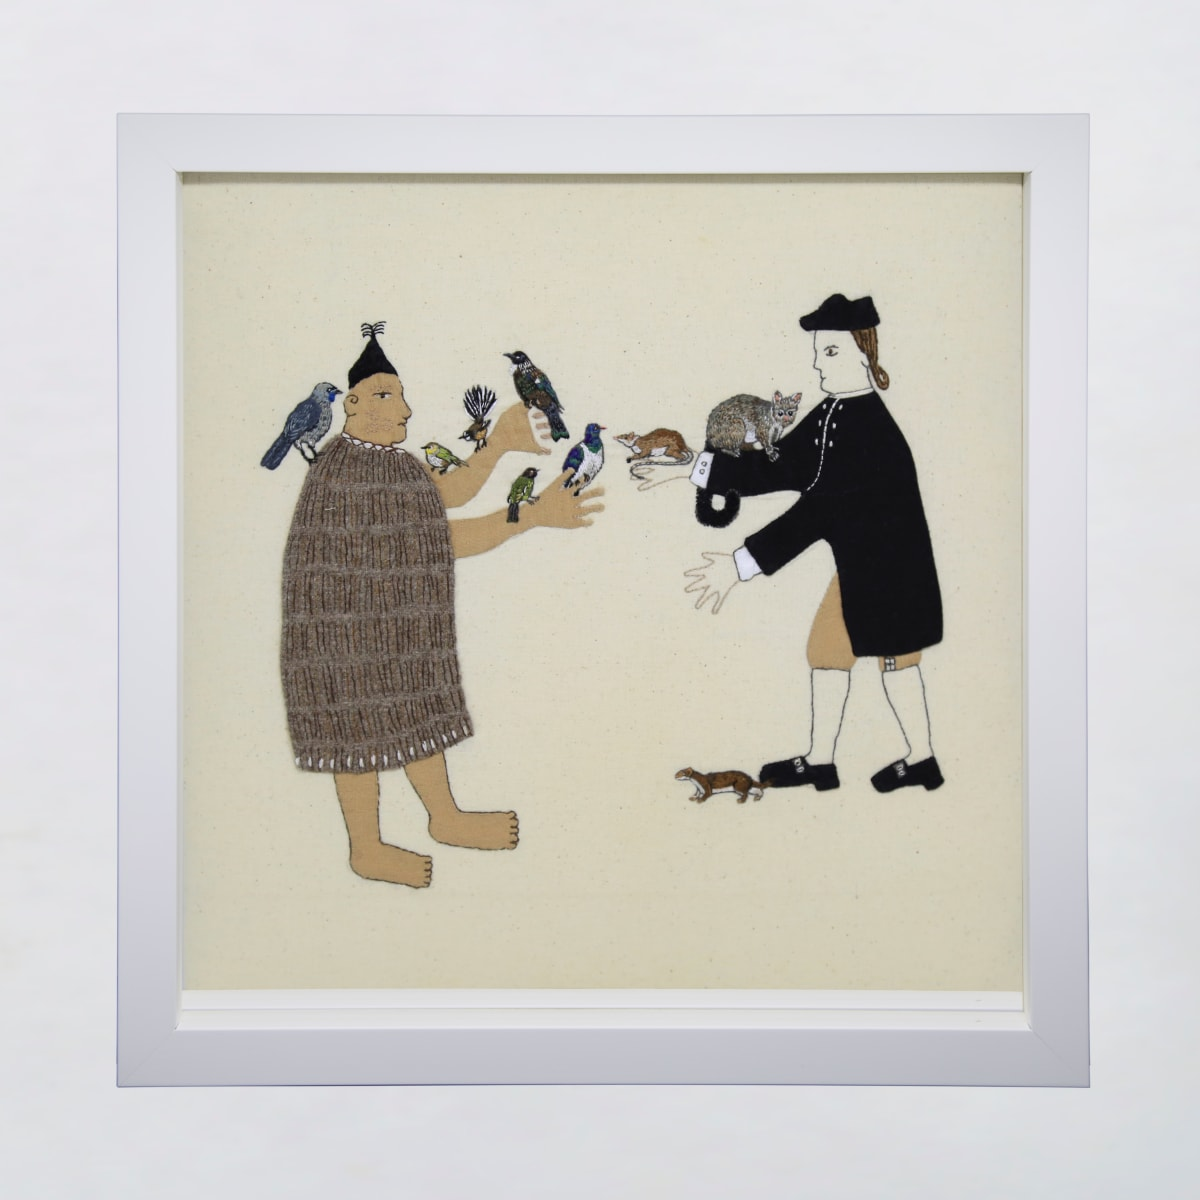 Sarah Munro, Trade Items - Dawn Chorus, Possum, Rat, Stoat, 2019